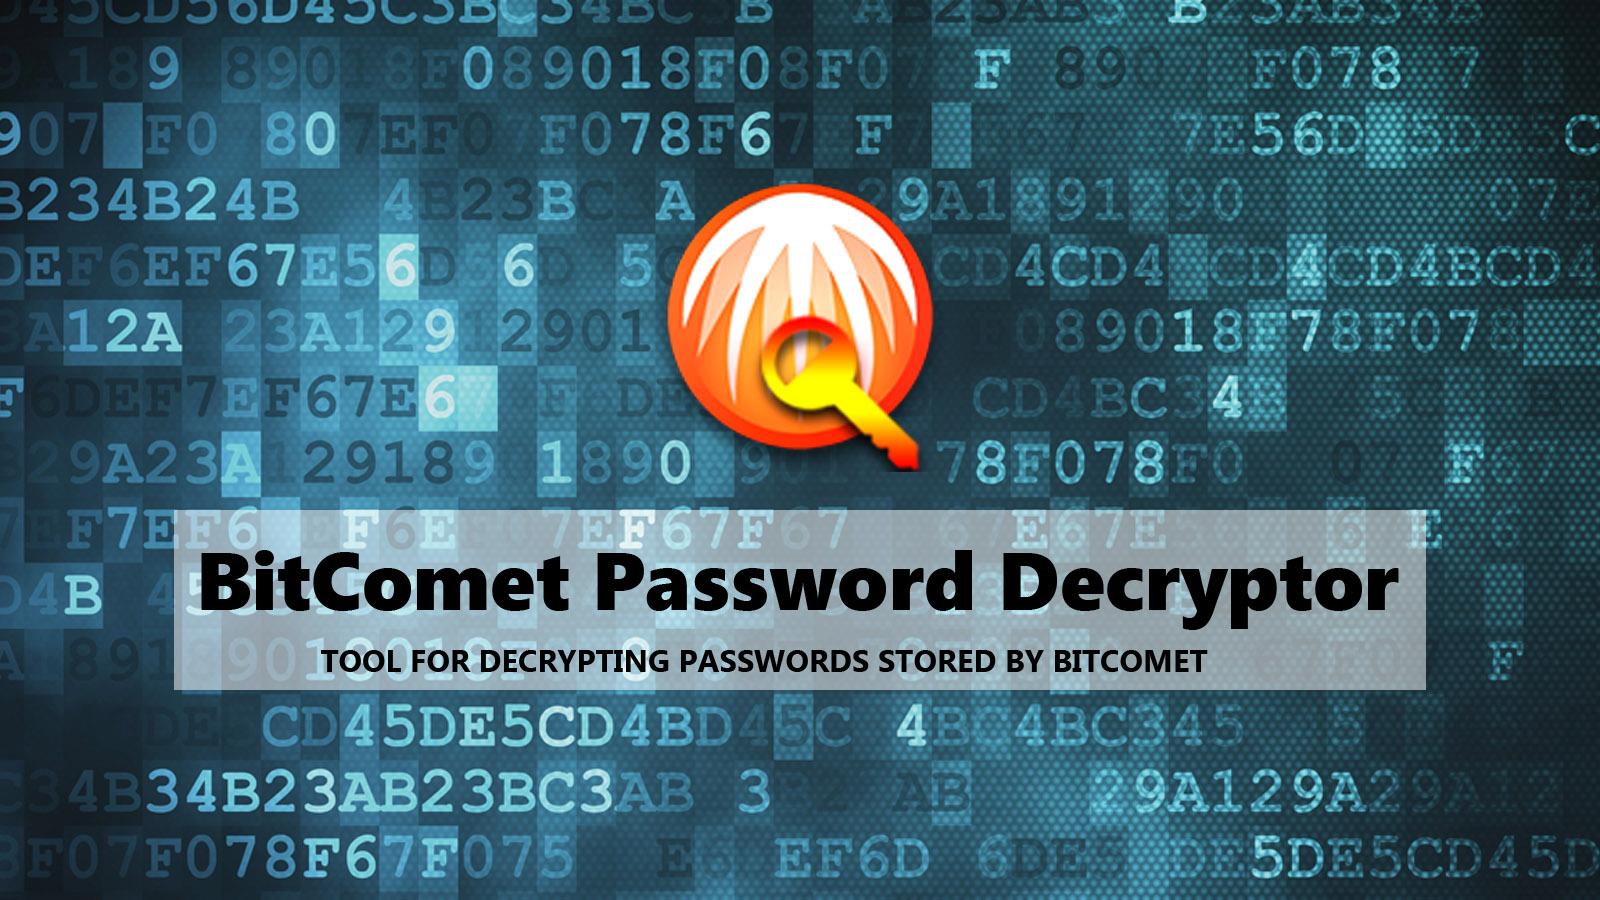 BitComet Password Decryptor